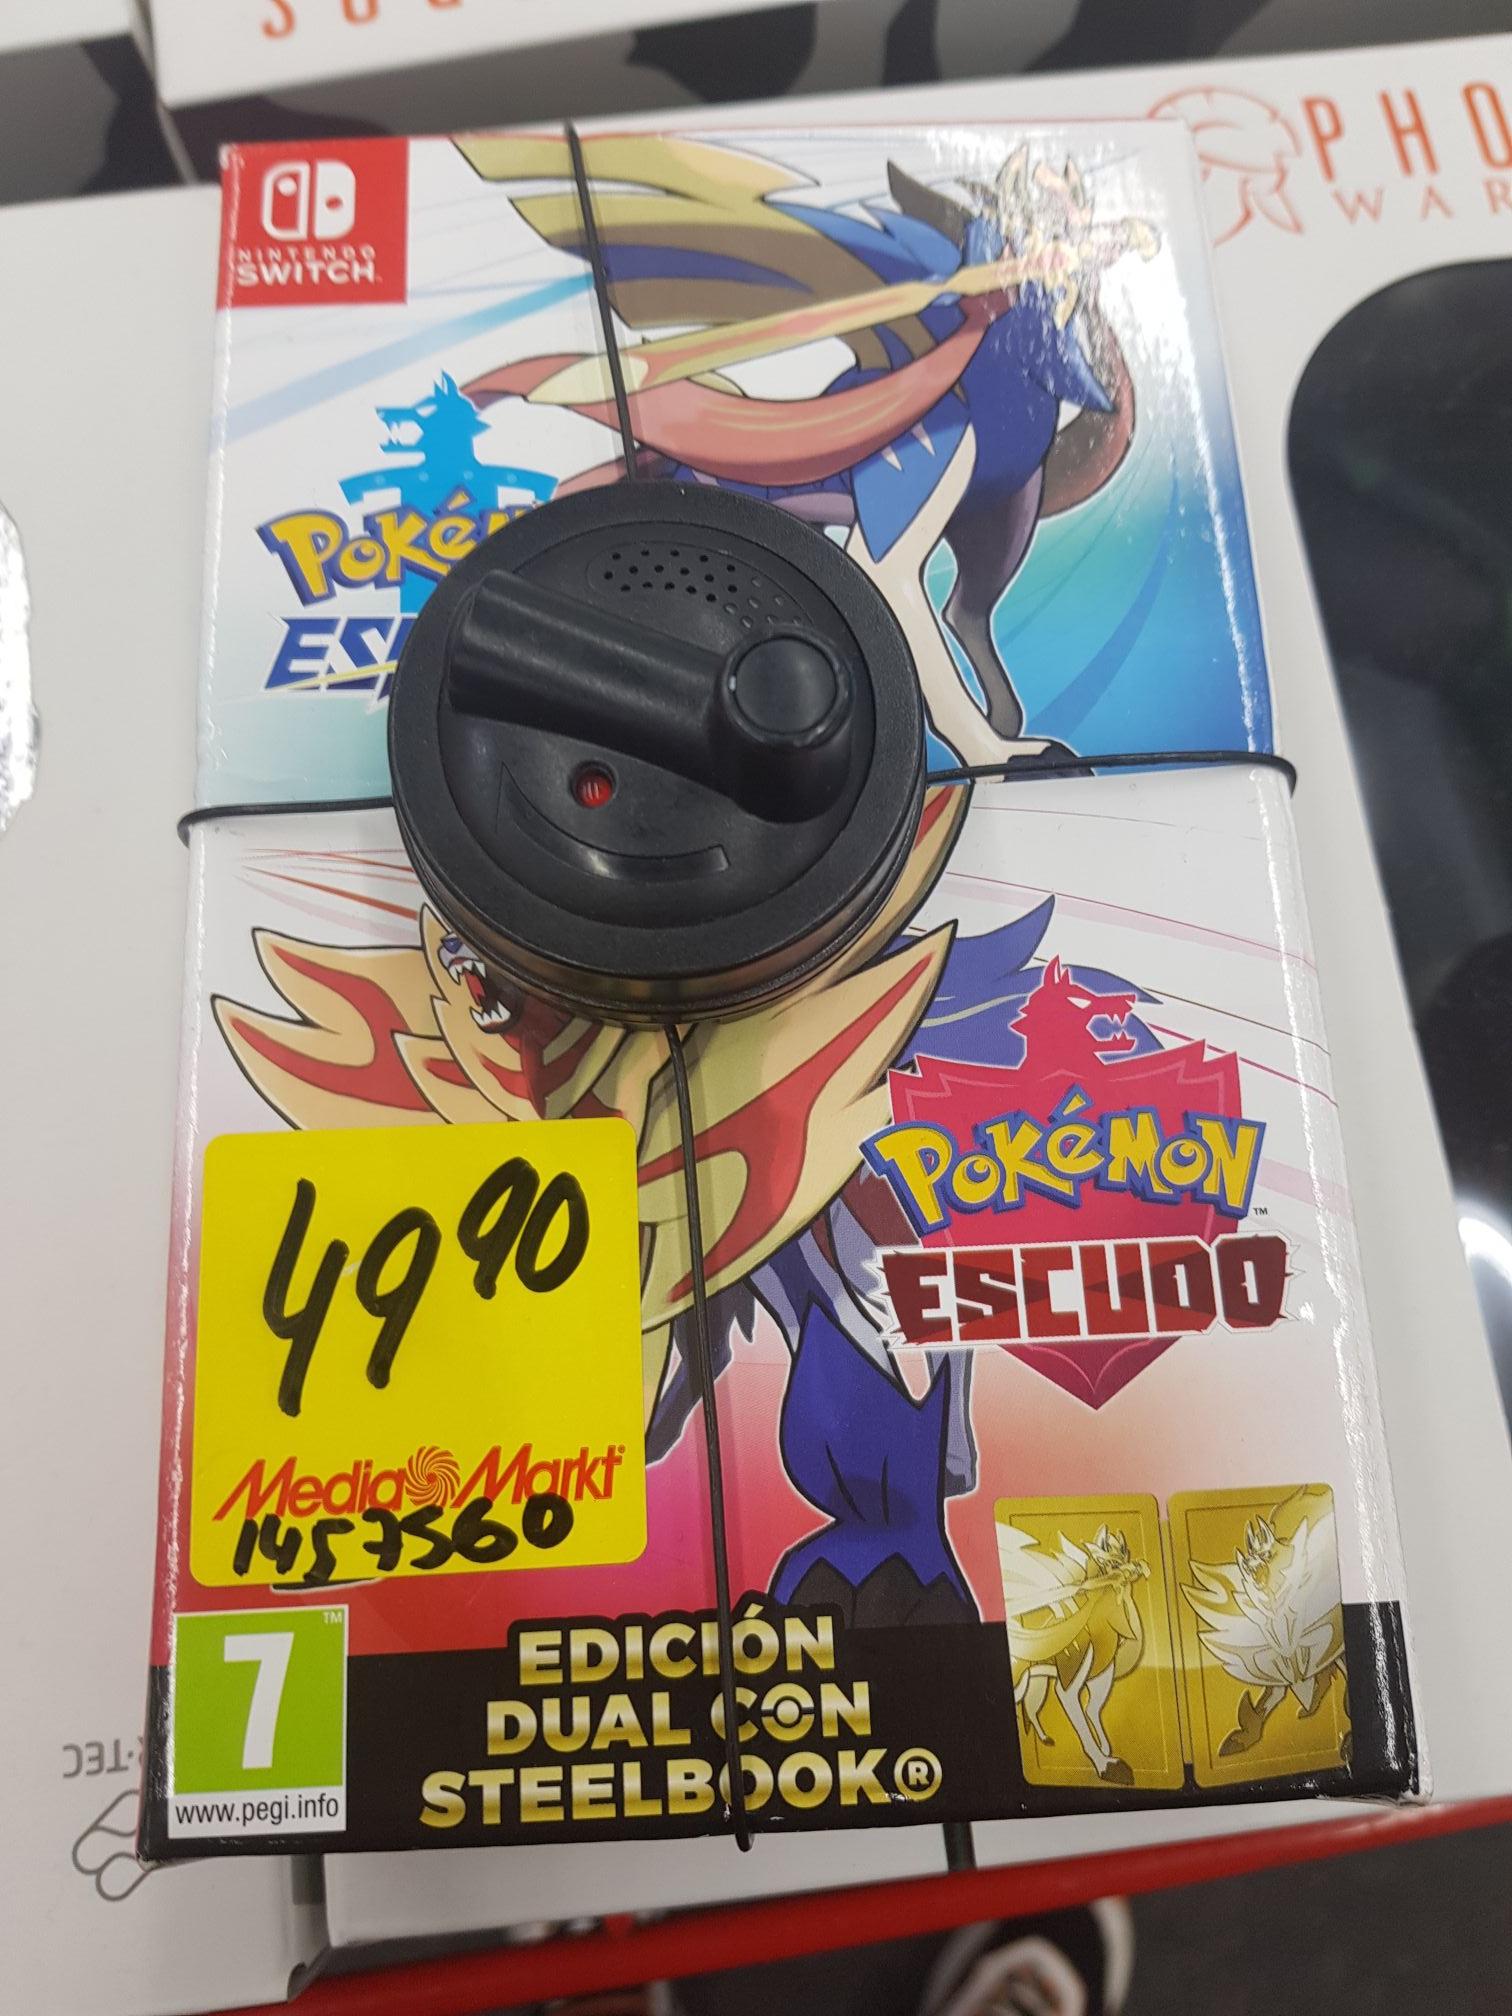 Pokémon escudo + pokemon espada + steelbook (Mediamarkt Toledo) y alguna oferta más